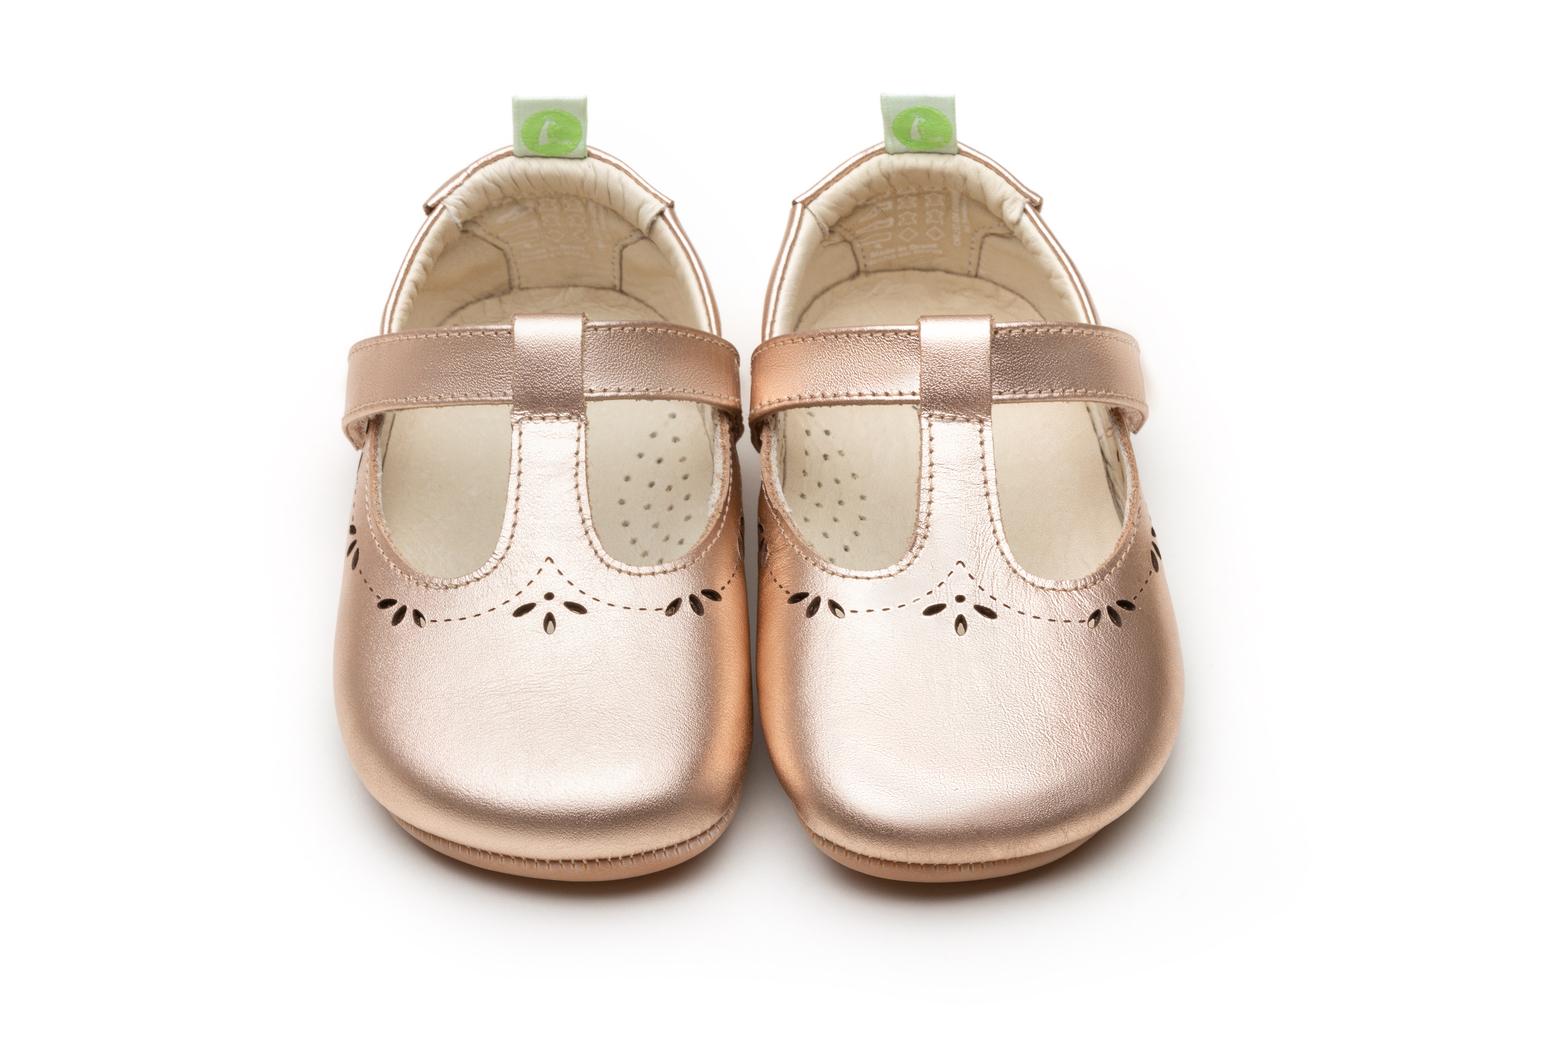 sapatilha Bebê feminino dainty